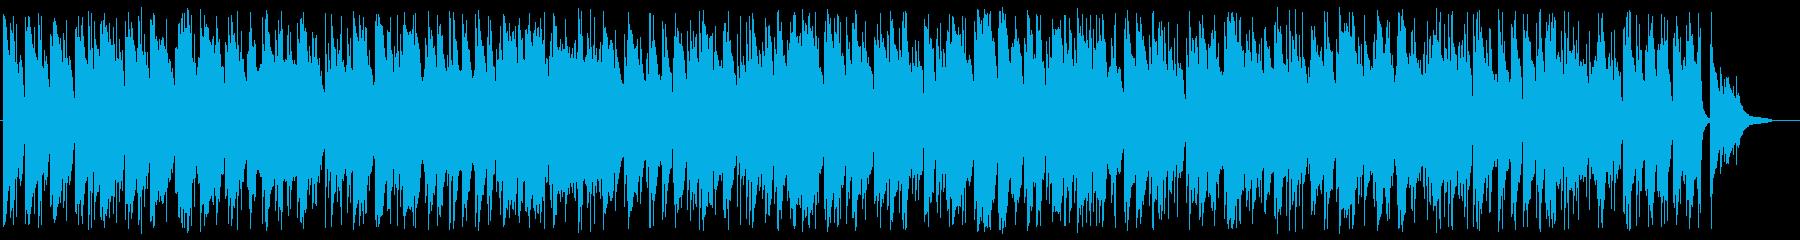 Amazing Grace Bossa Arrange's reproduced waveform